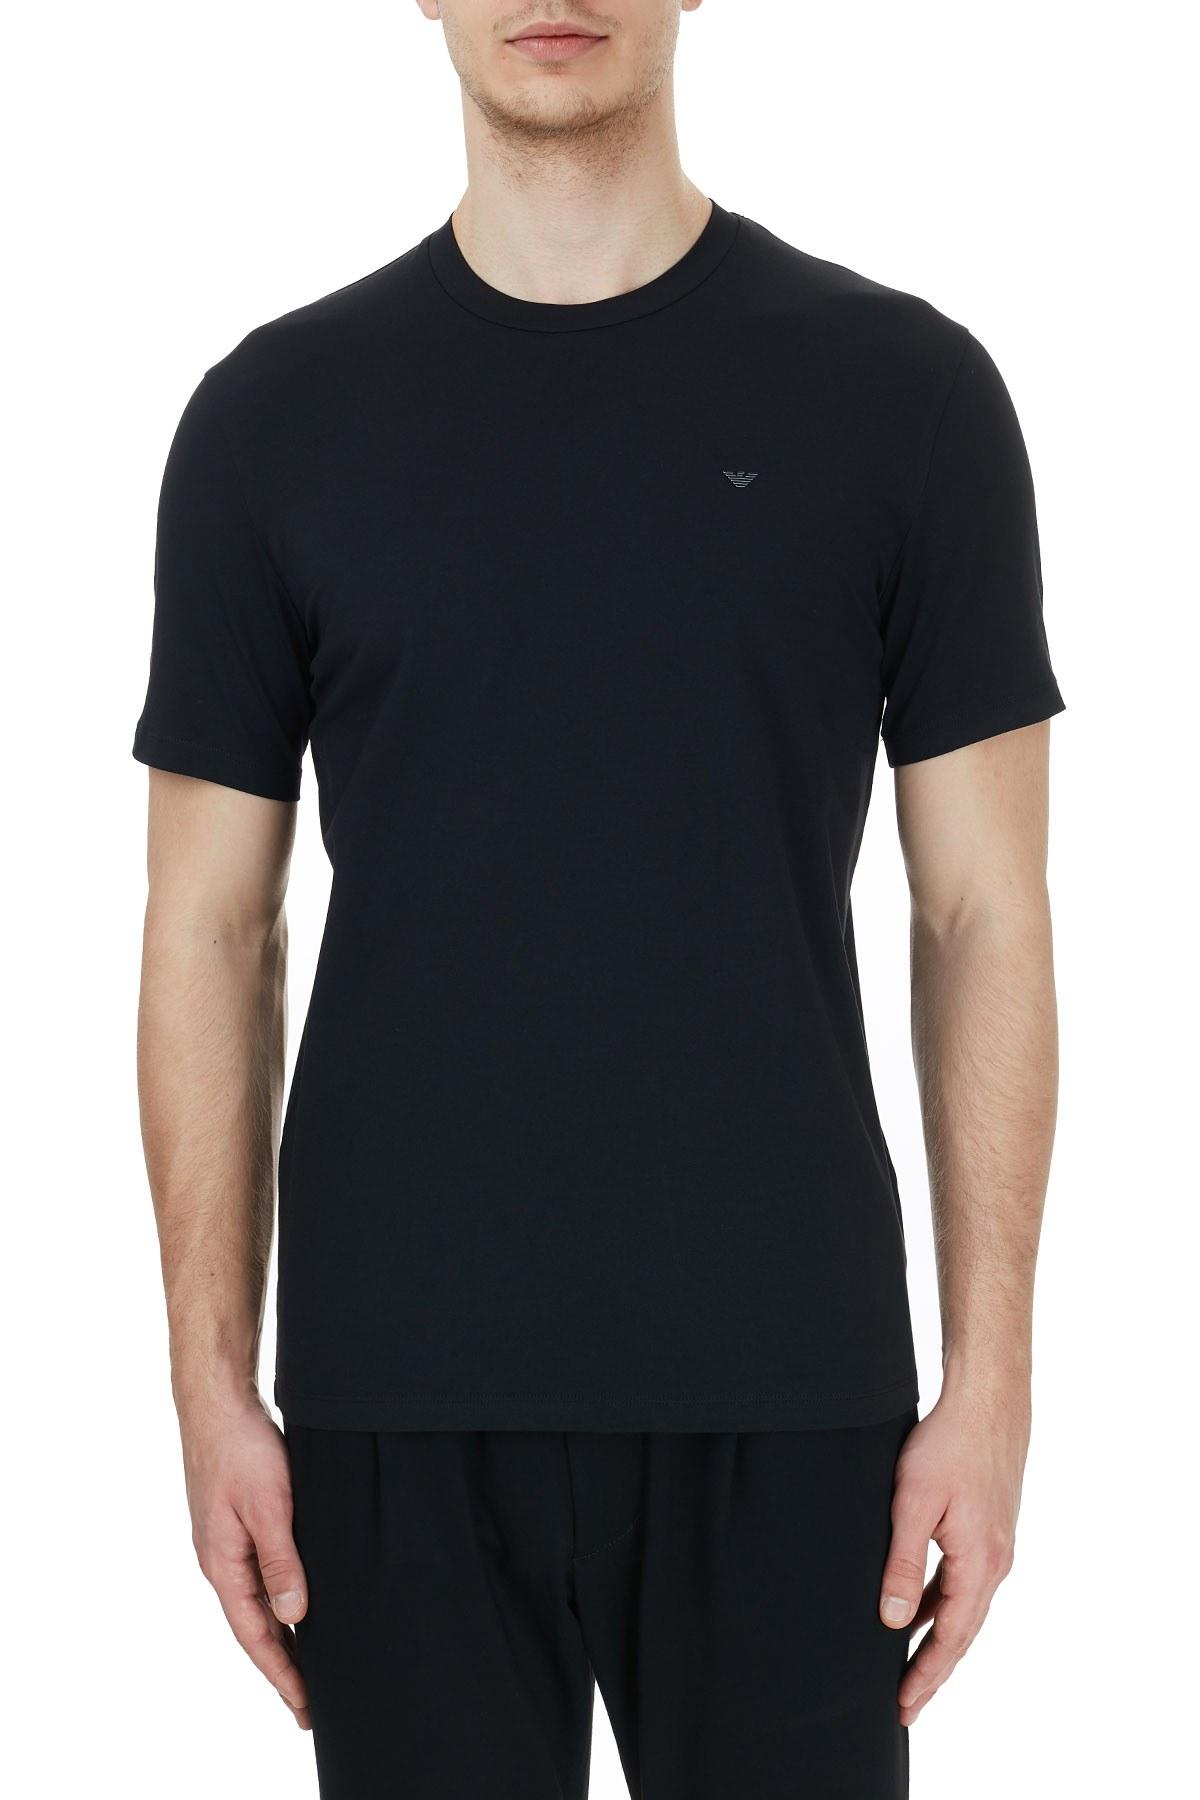 Emporio Armani Bisiklet Yaka Pamuklu Erkek T Shirt 6H1TS2 1JJRZ 0999 SİYAH